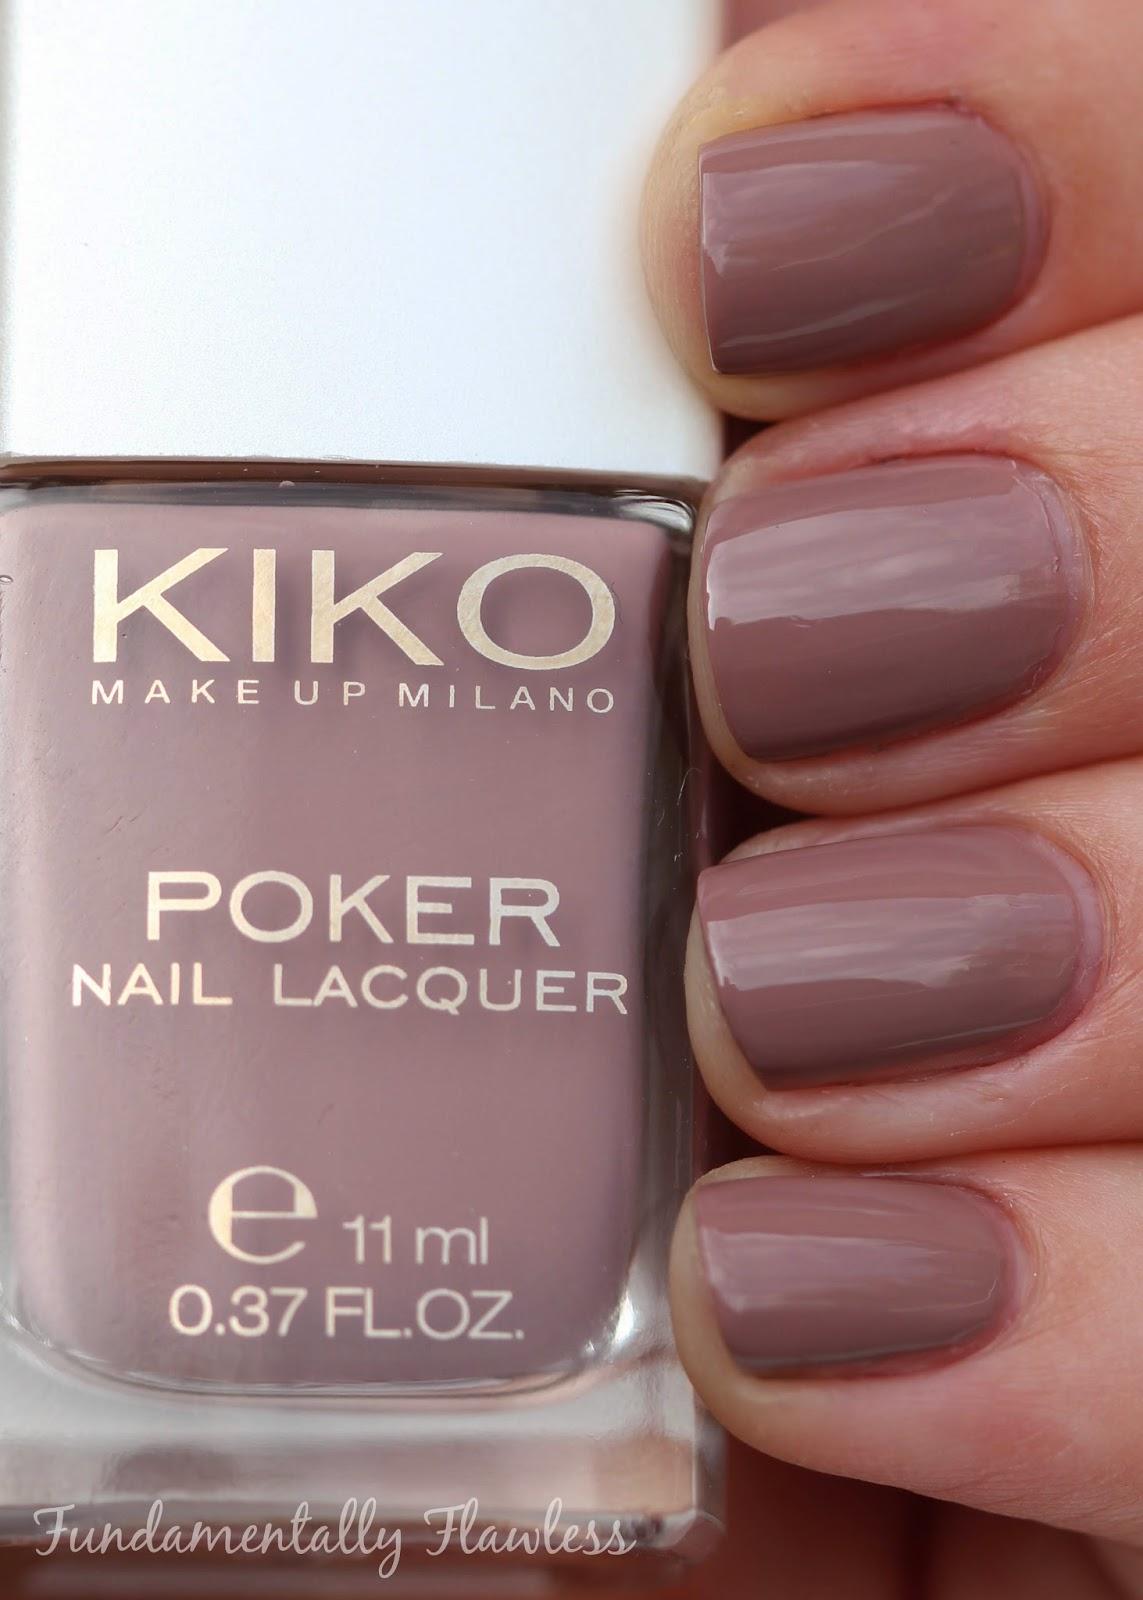 Fundamentally Flawless: Kiko Poker Nail Lacquer from the Daring Game ...